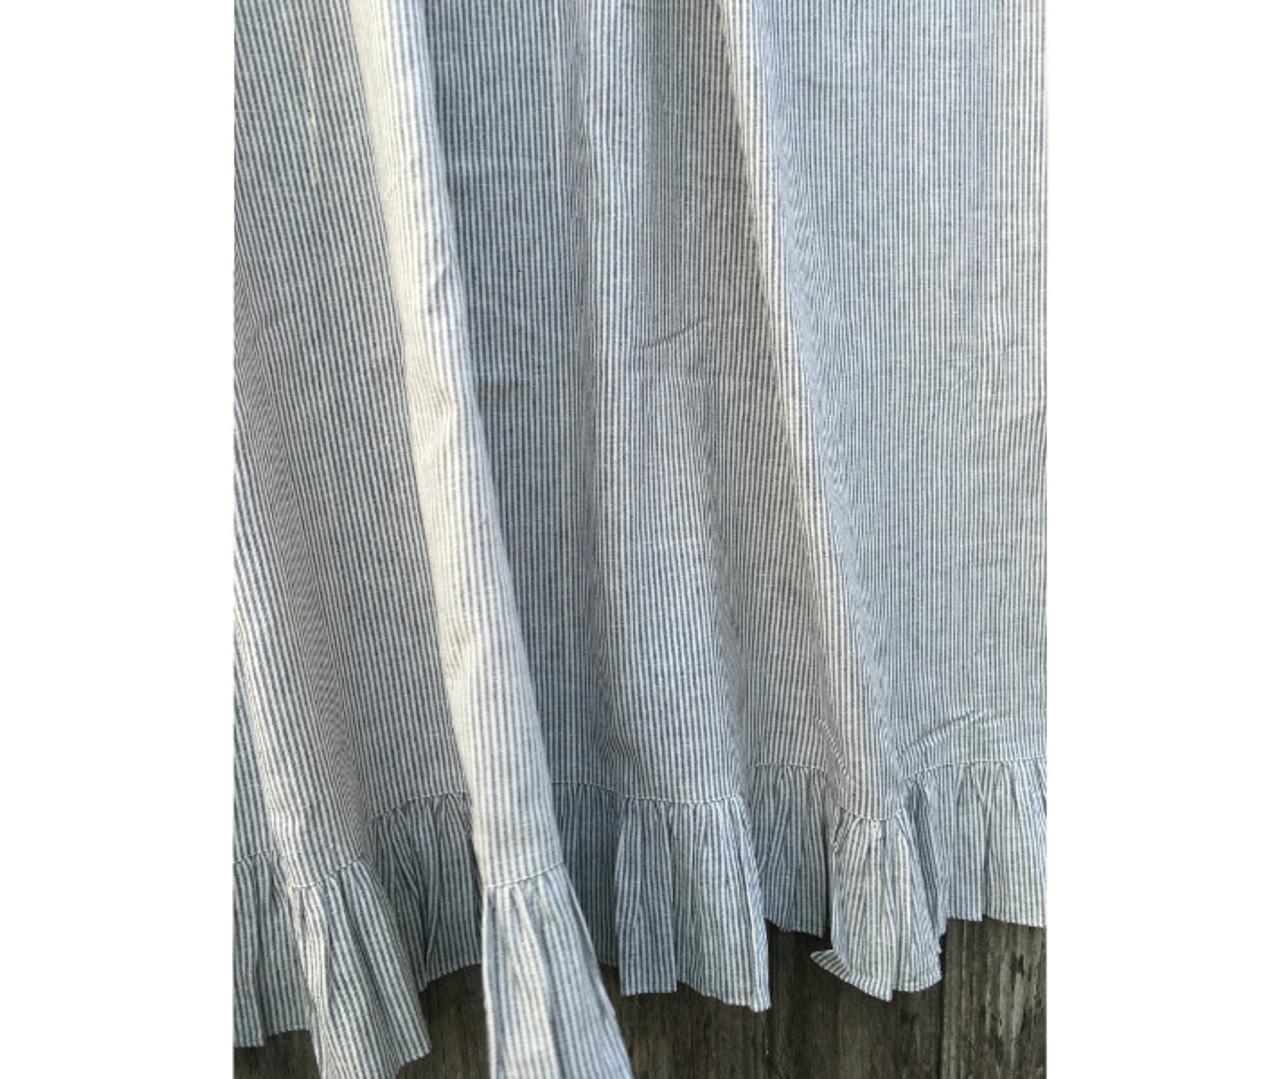 Subtle Black And White Ticking Stripe Ruffled Linen Shower Curtain